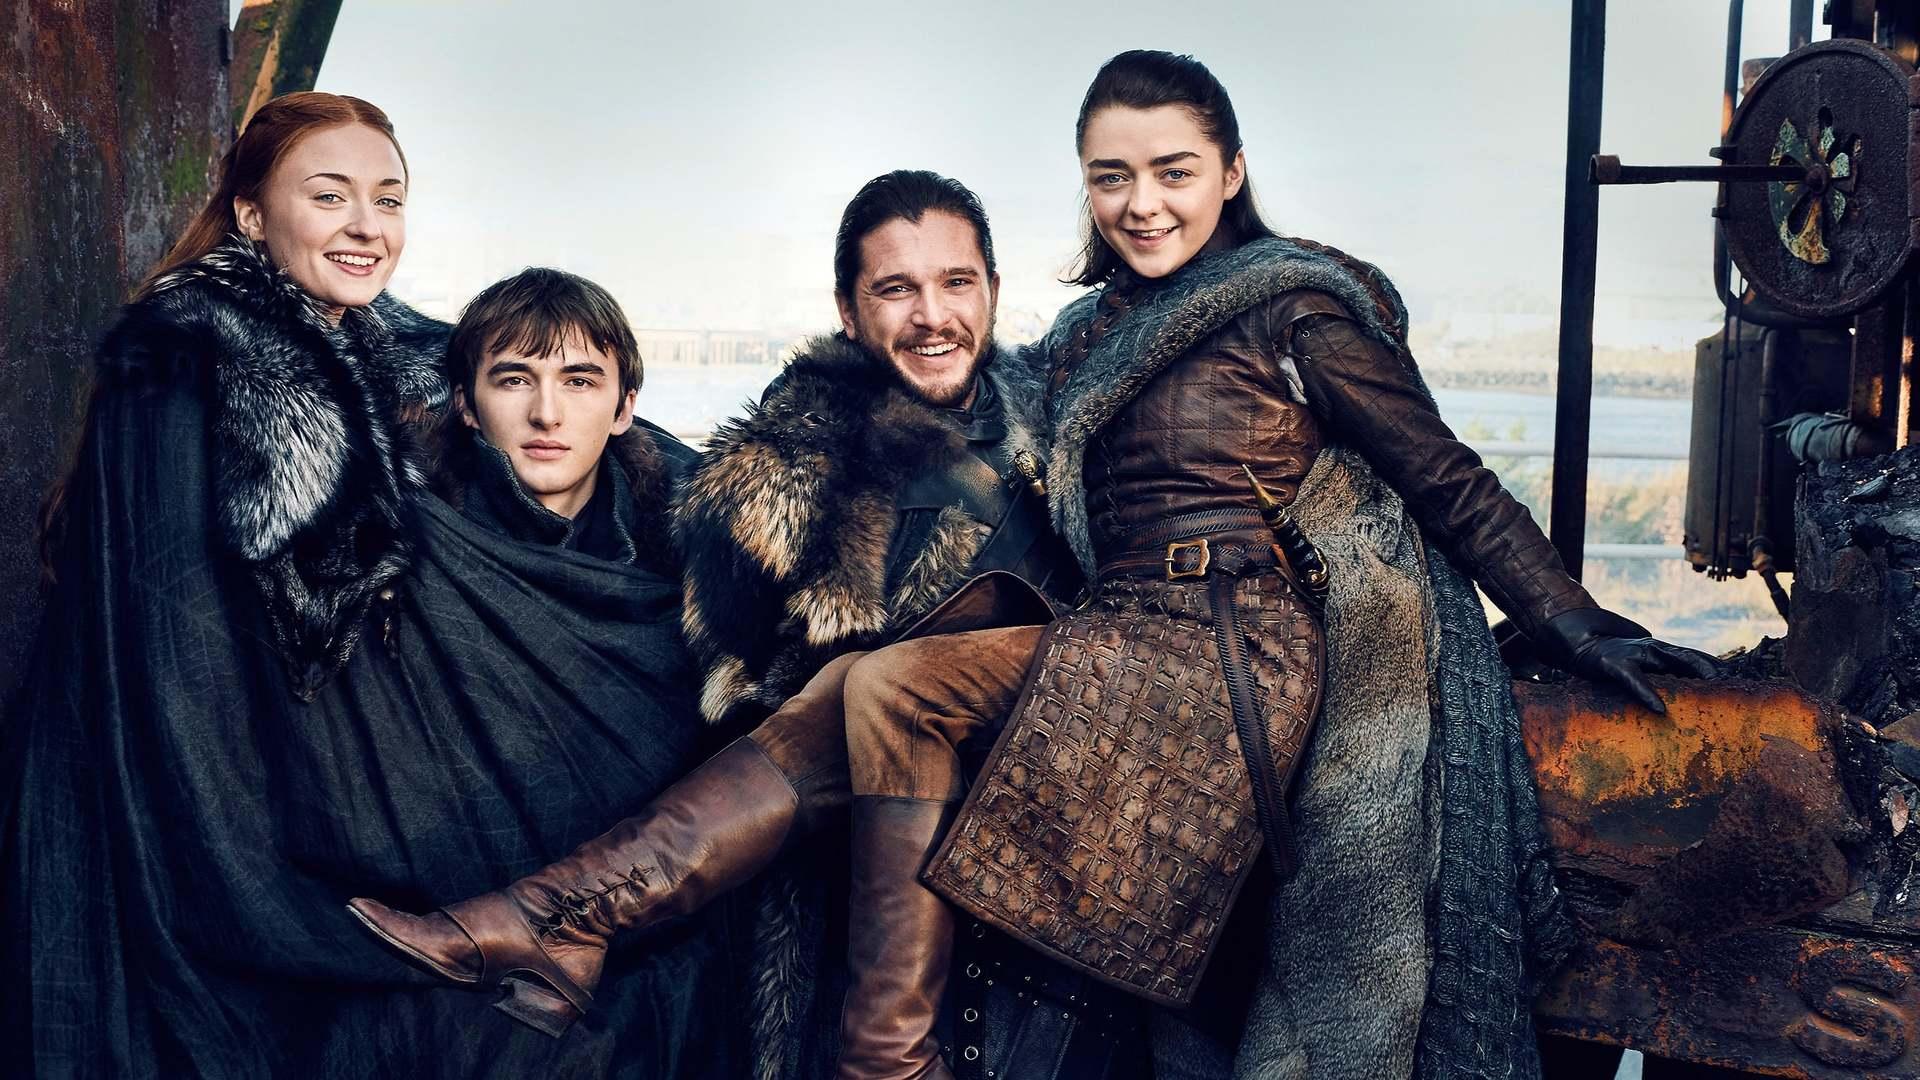 Кадры из фильма Игра престолов Game of Thrones 2011